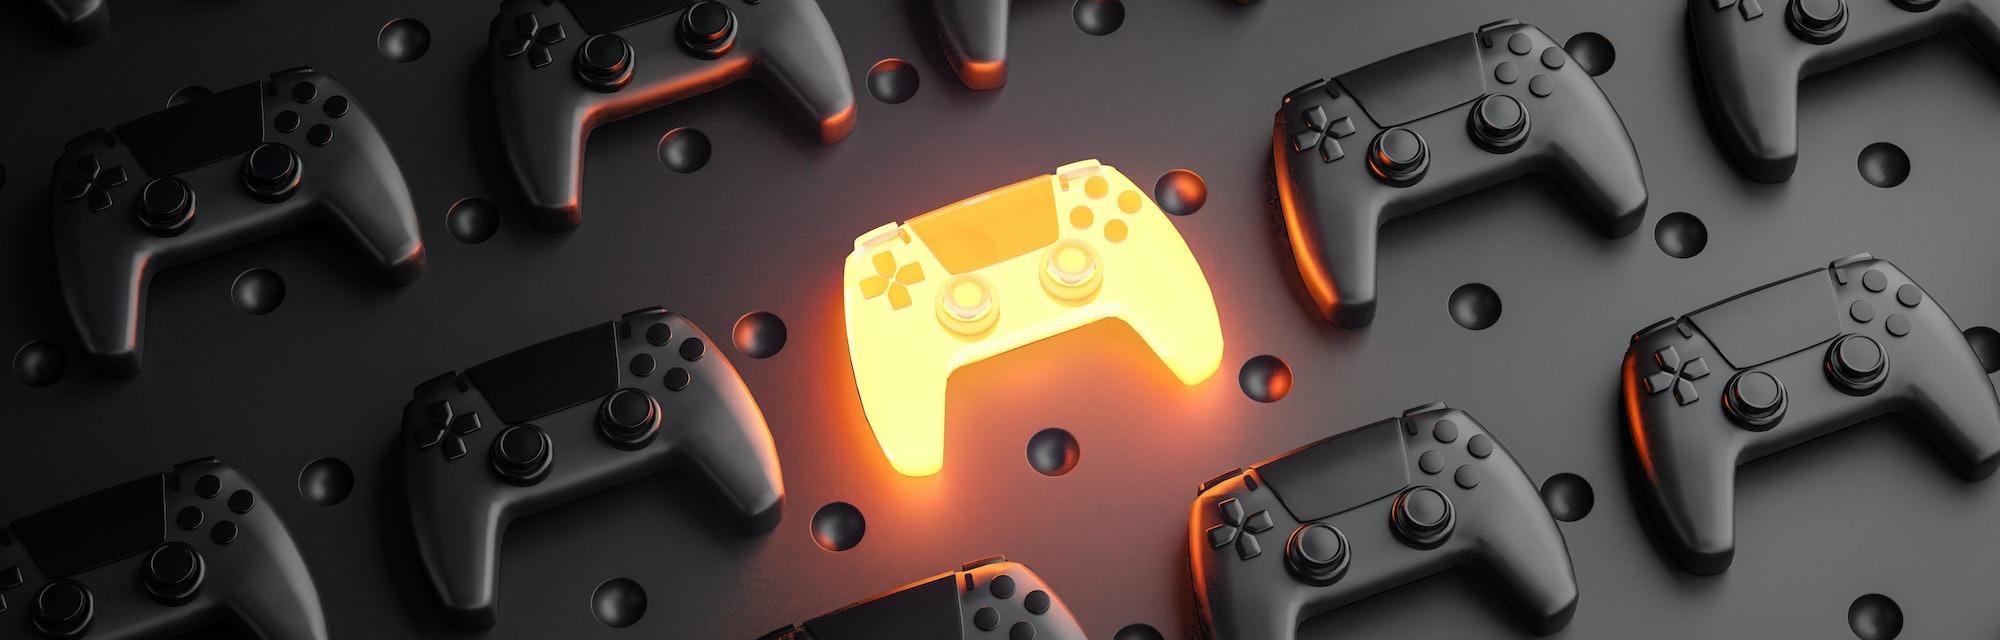 Outstanding Concept. Glowing Gamepad Between Multiple Black Joysticks Background 3D Rendering